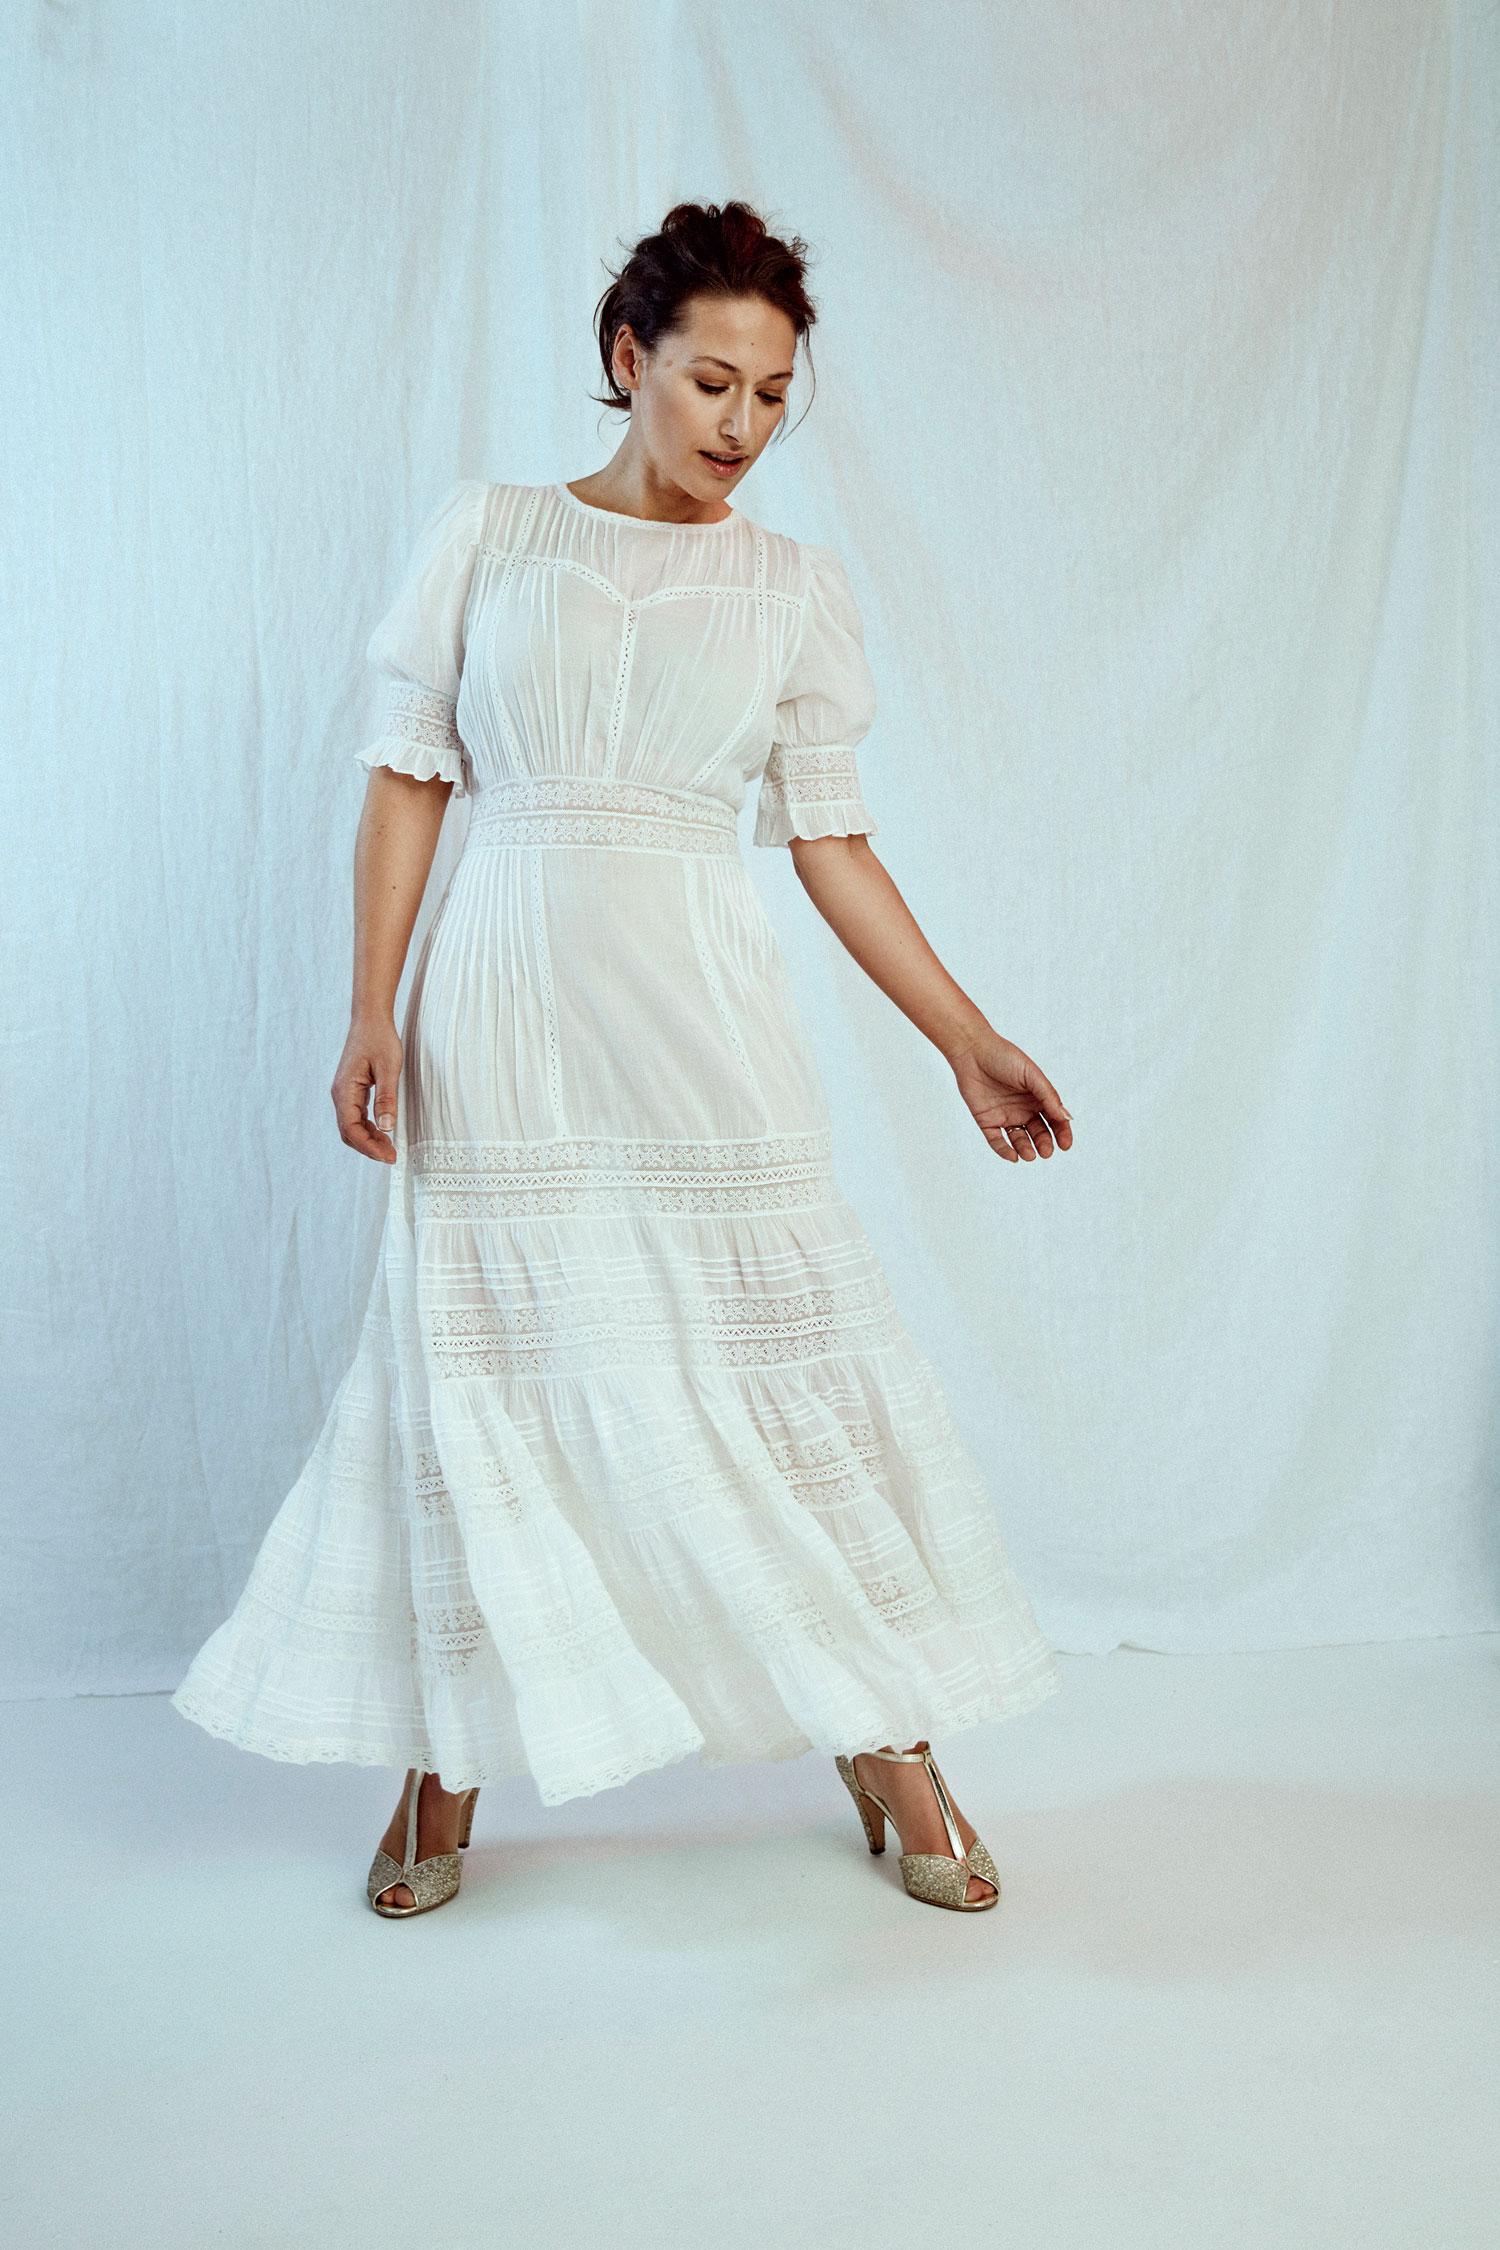 Pia-Tjelta-SS19_Mio-Dress-White_-NOK4200.jpg